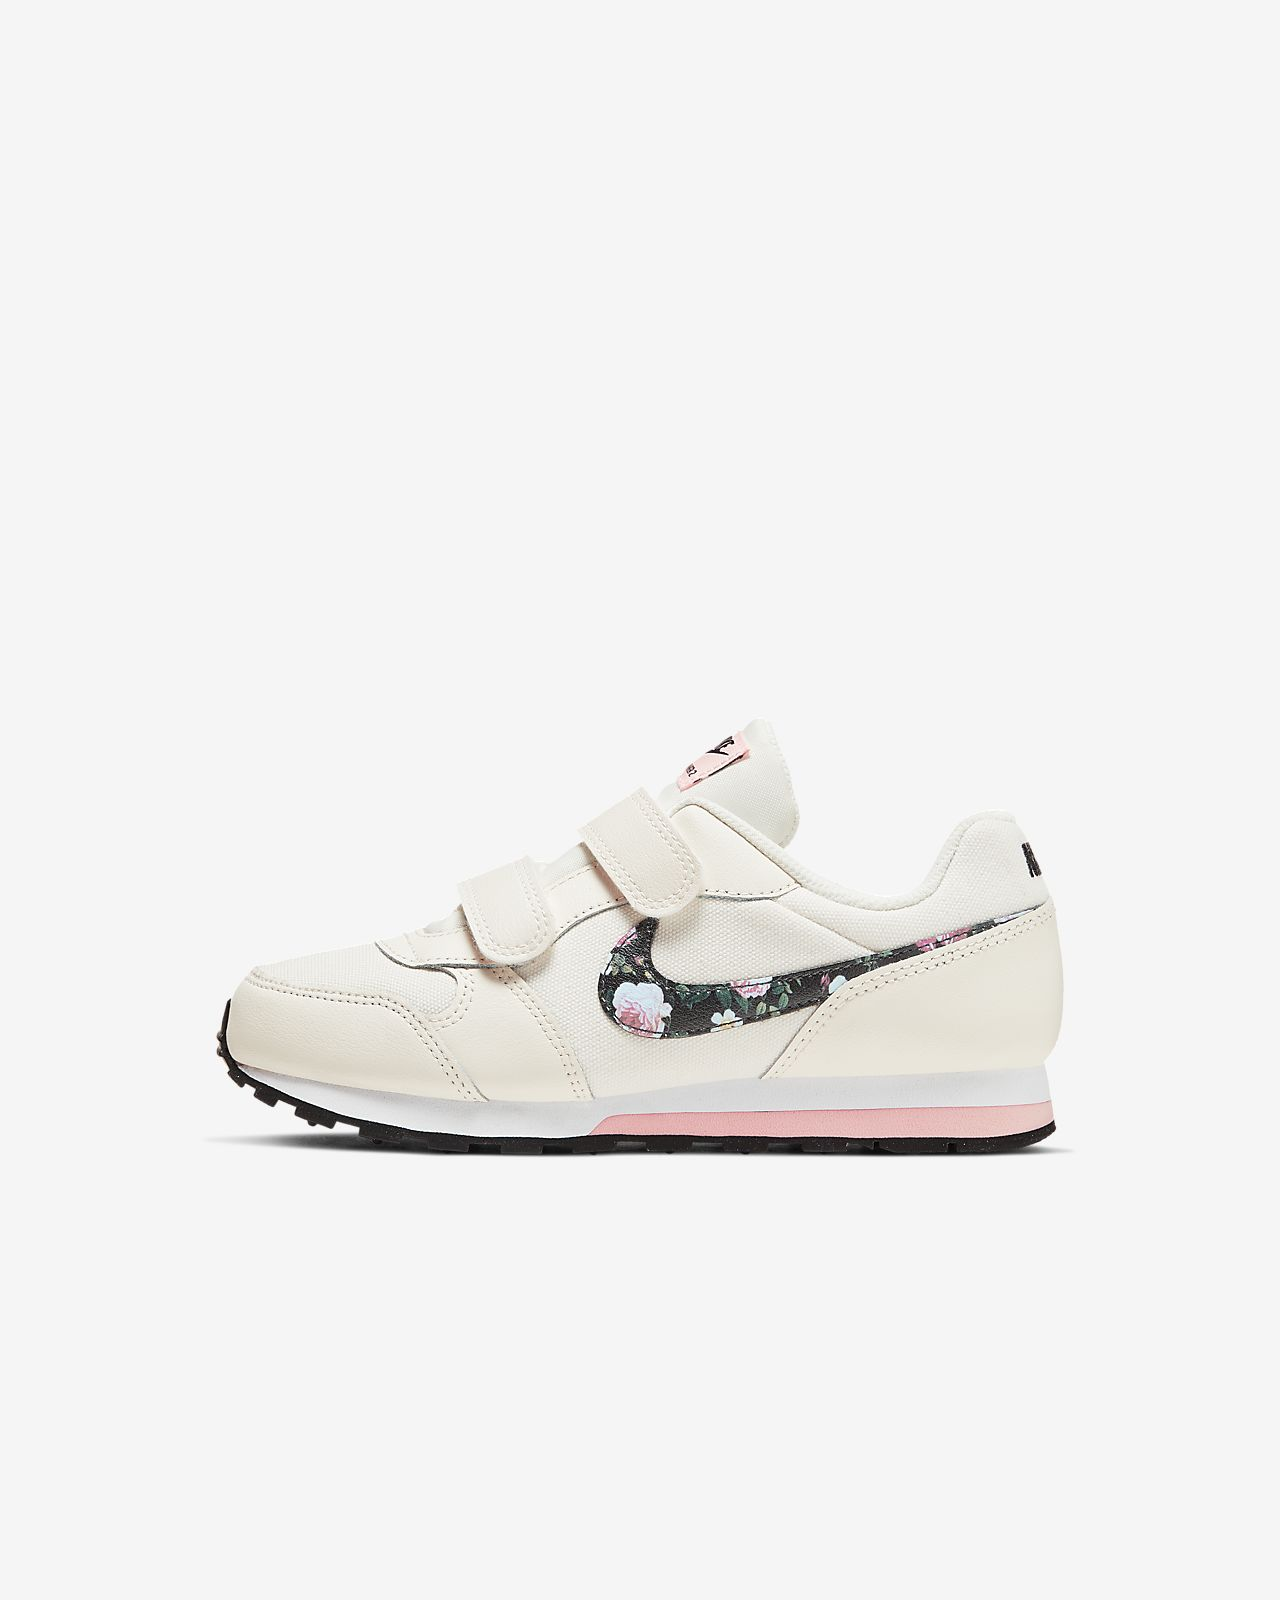 Chaussure Nike MD Runner 2 Vintage Floral pour Jeune enfant